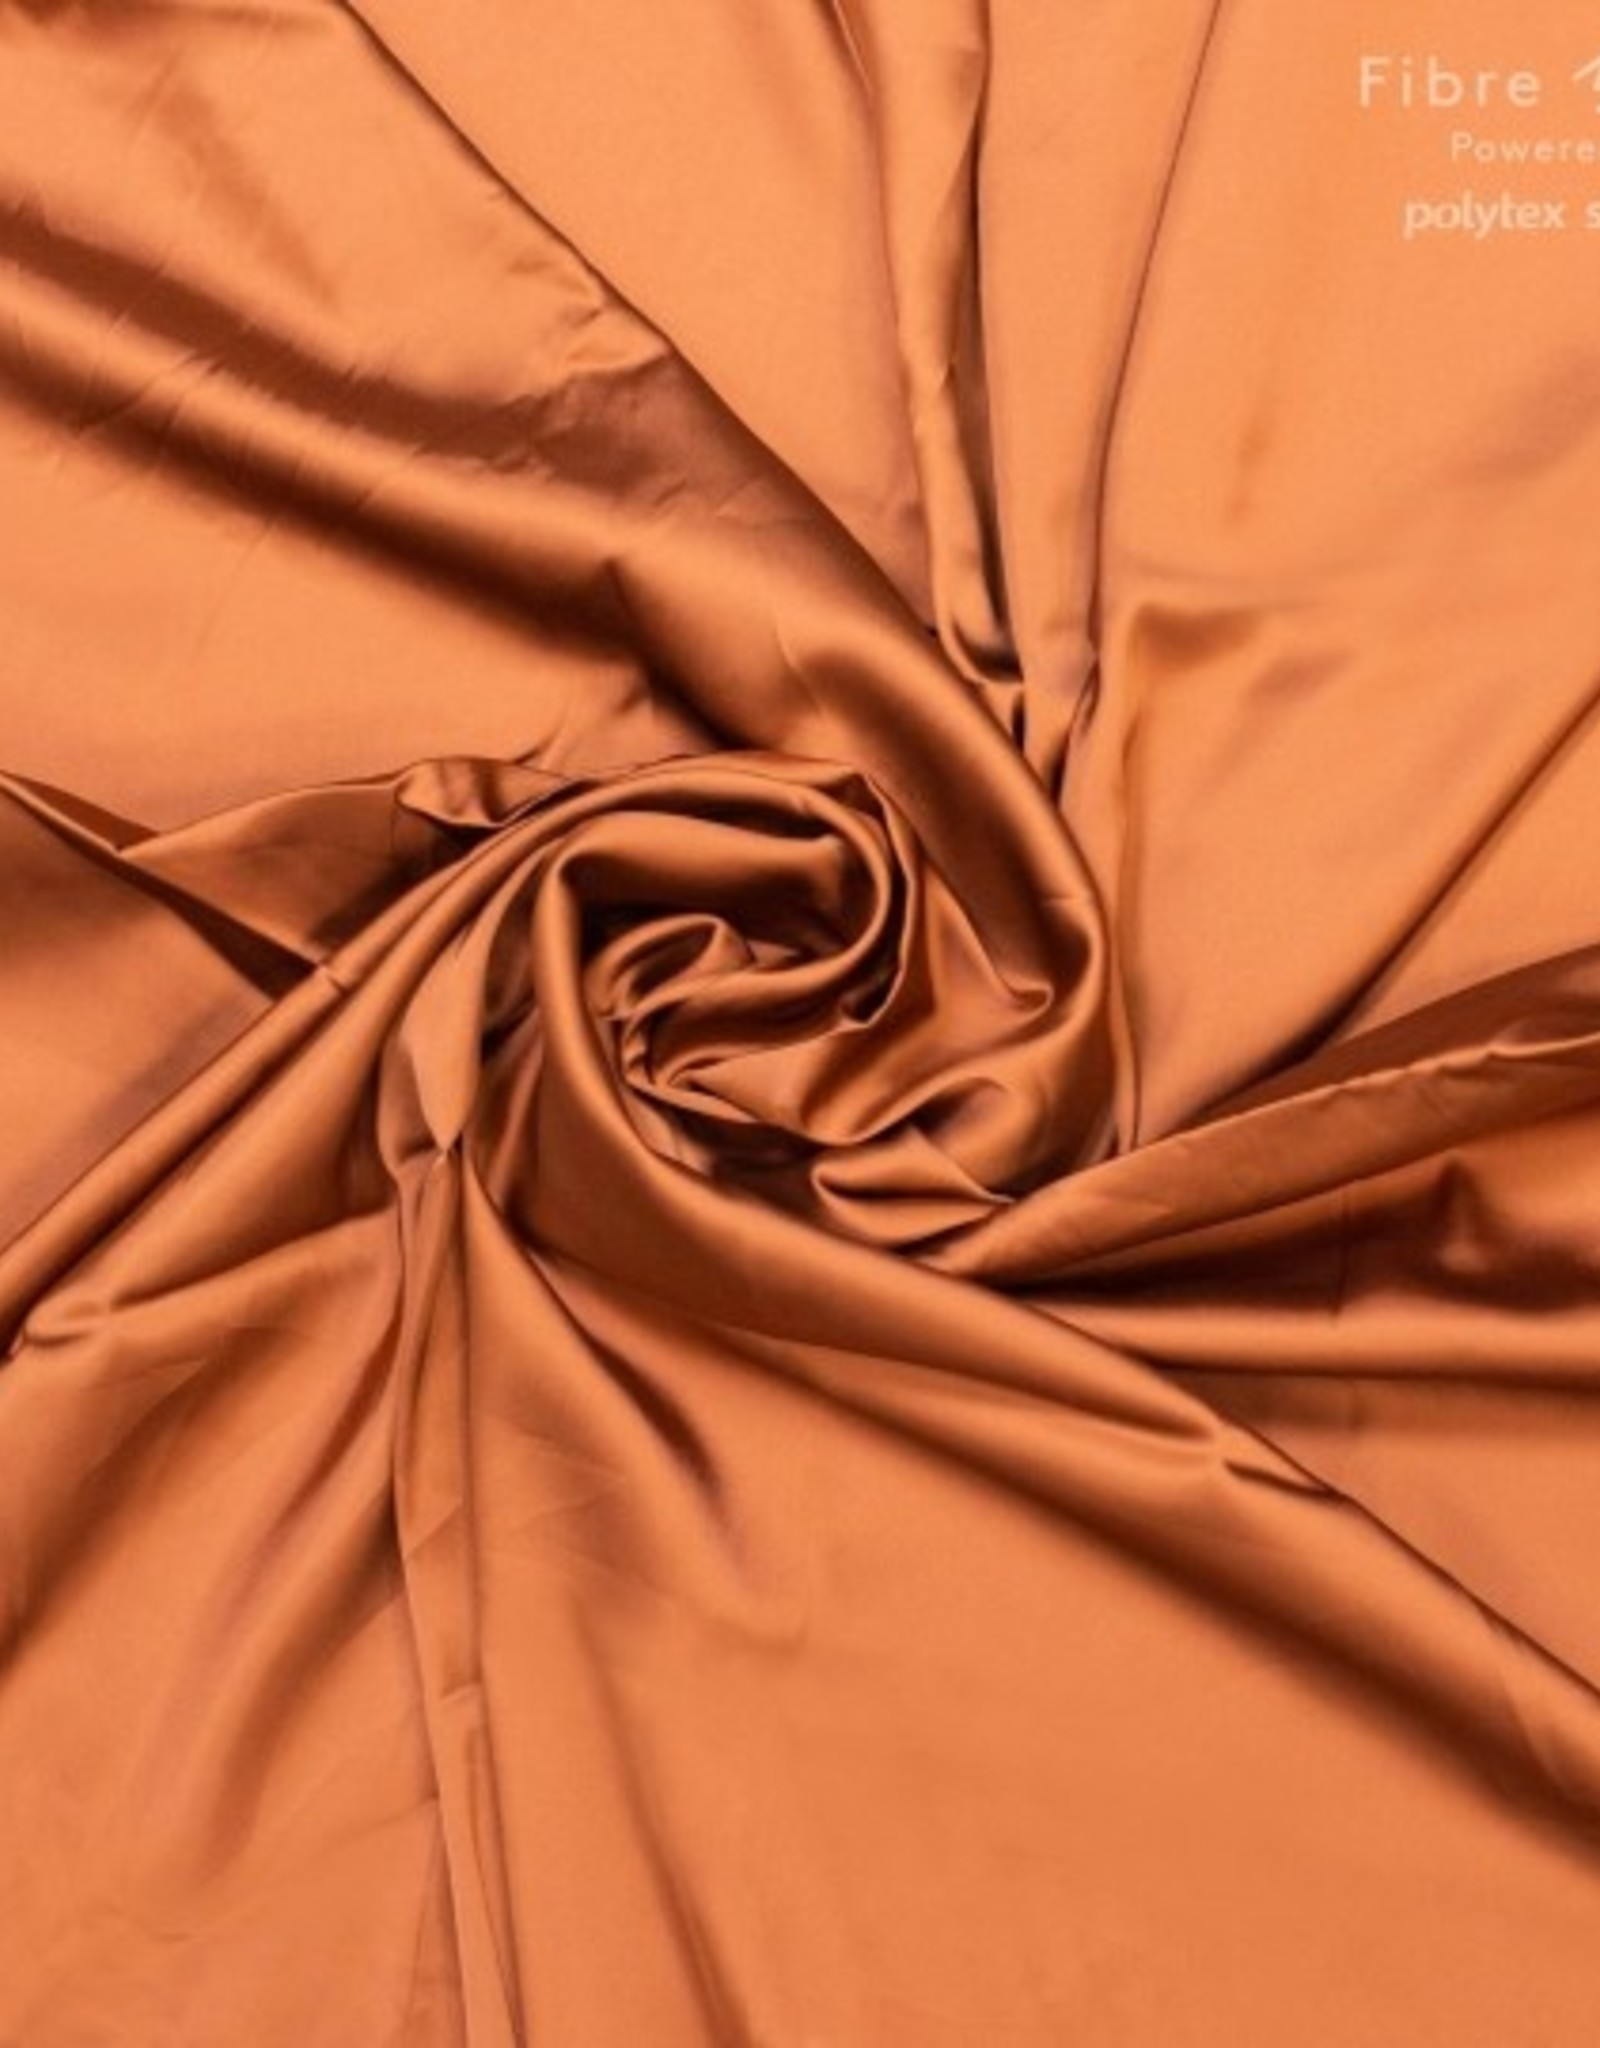 Fibre Mood Viscose Satijn orange FM pipa